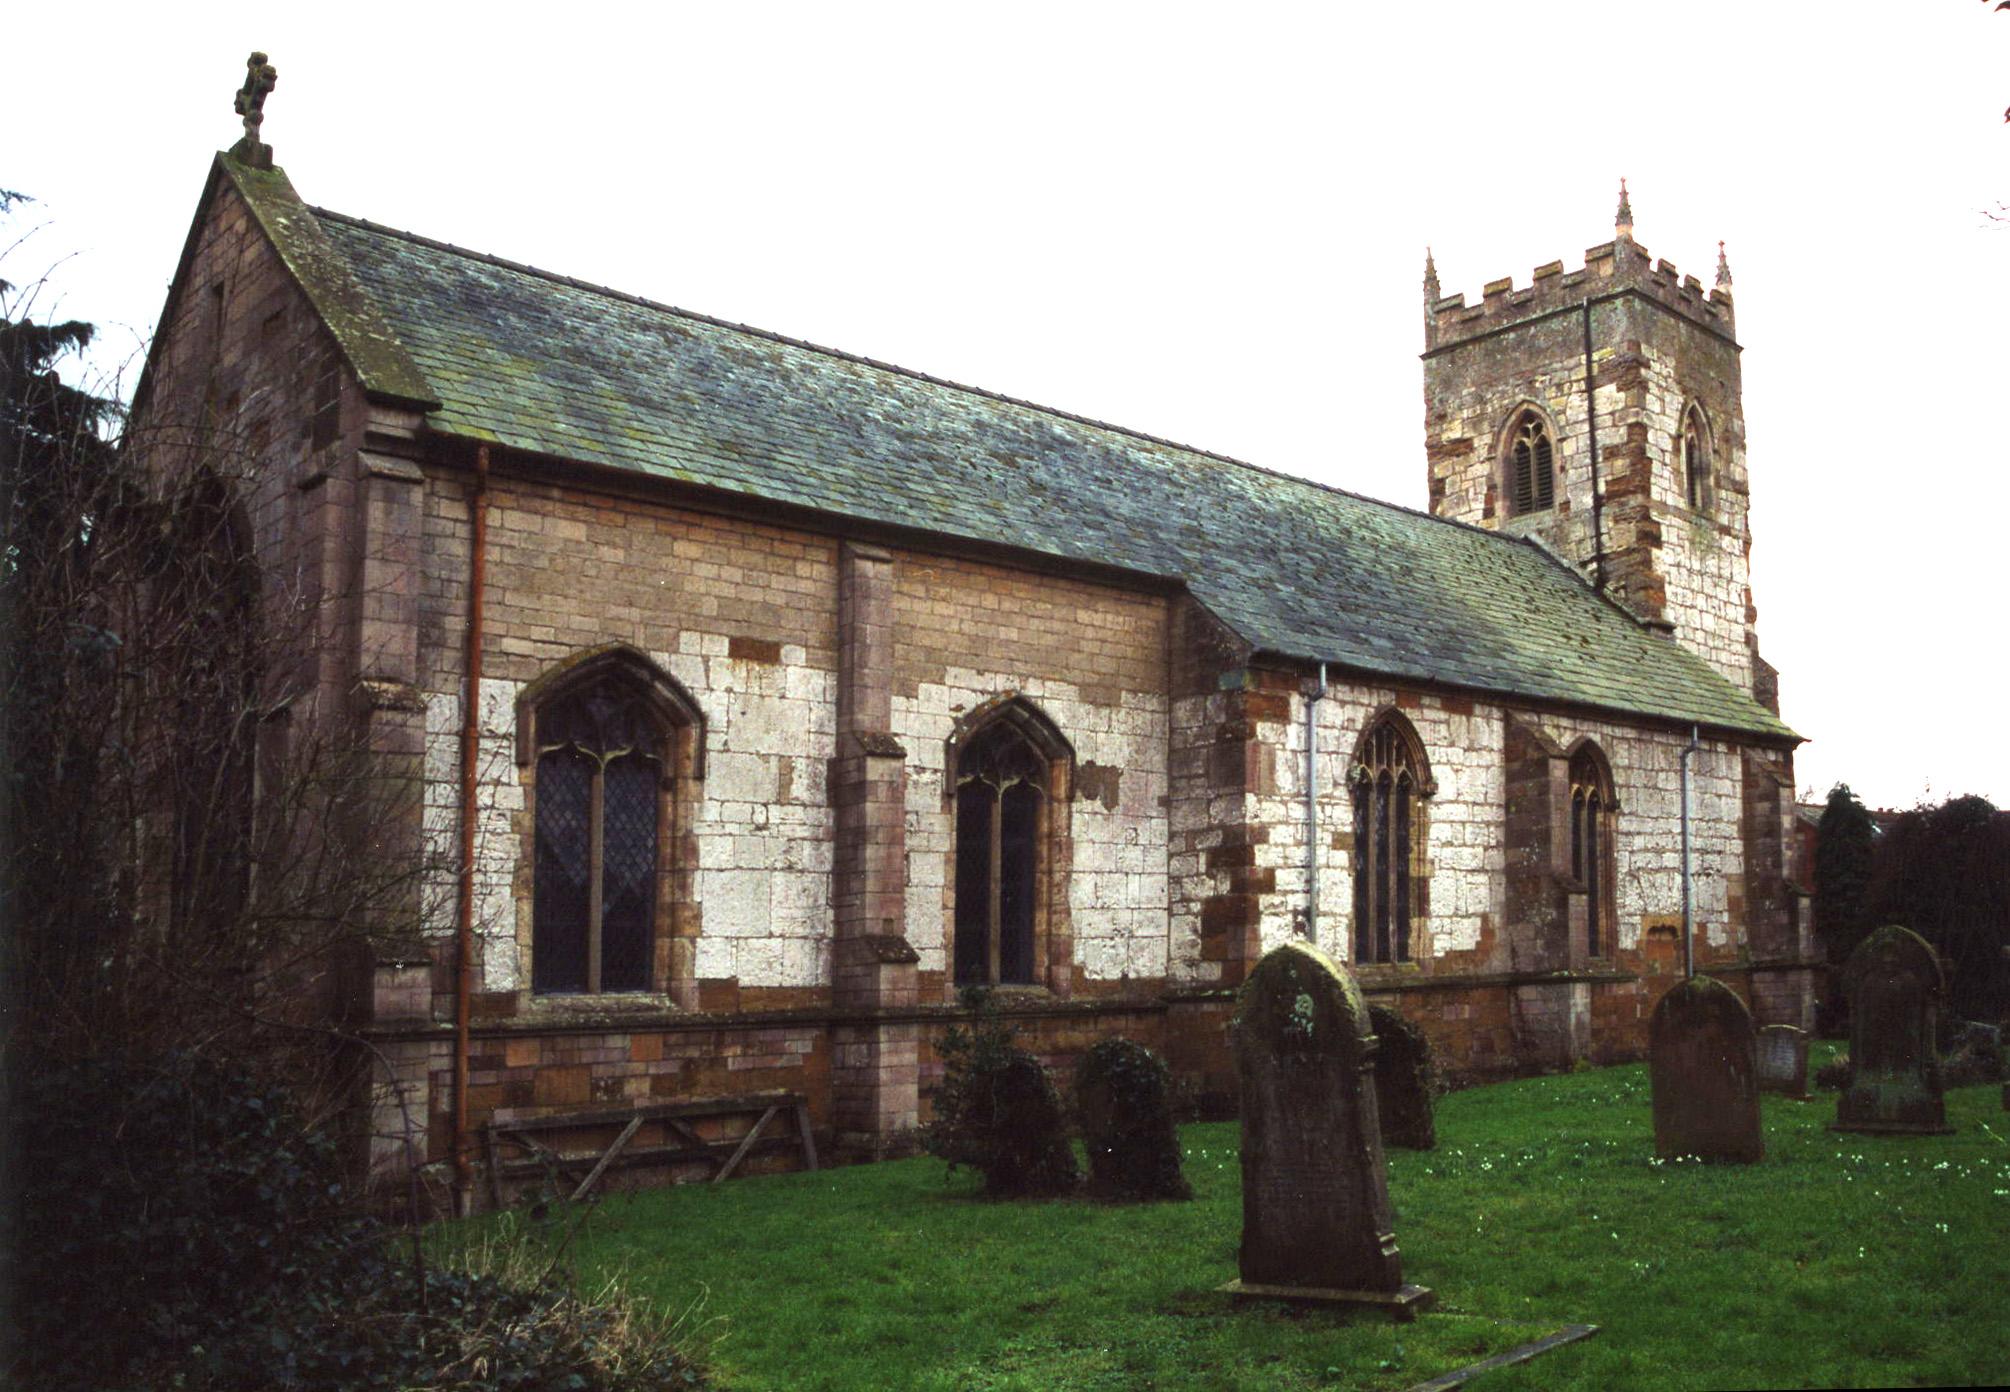 Covenham St. Mary